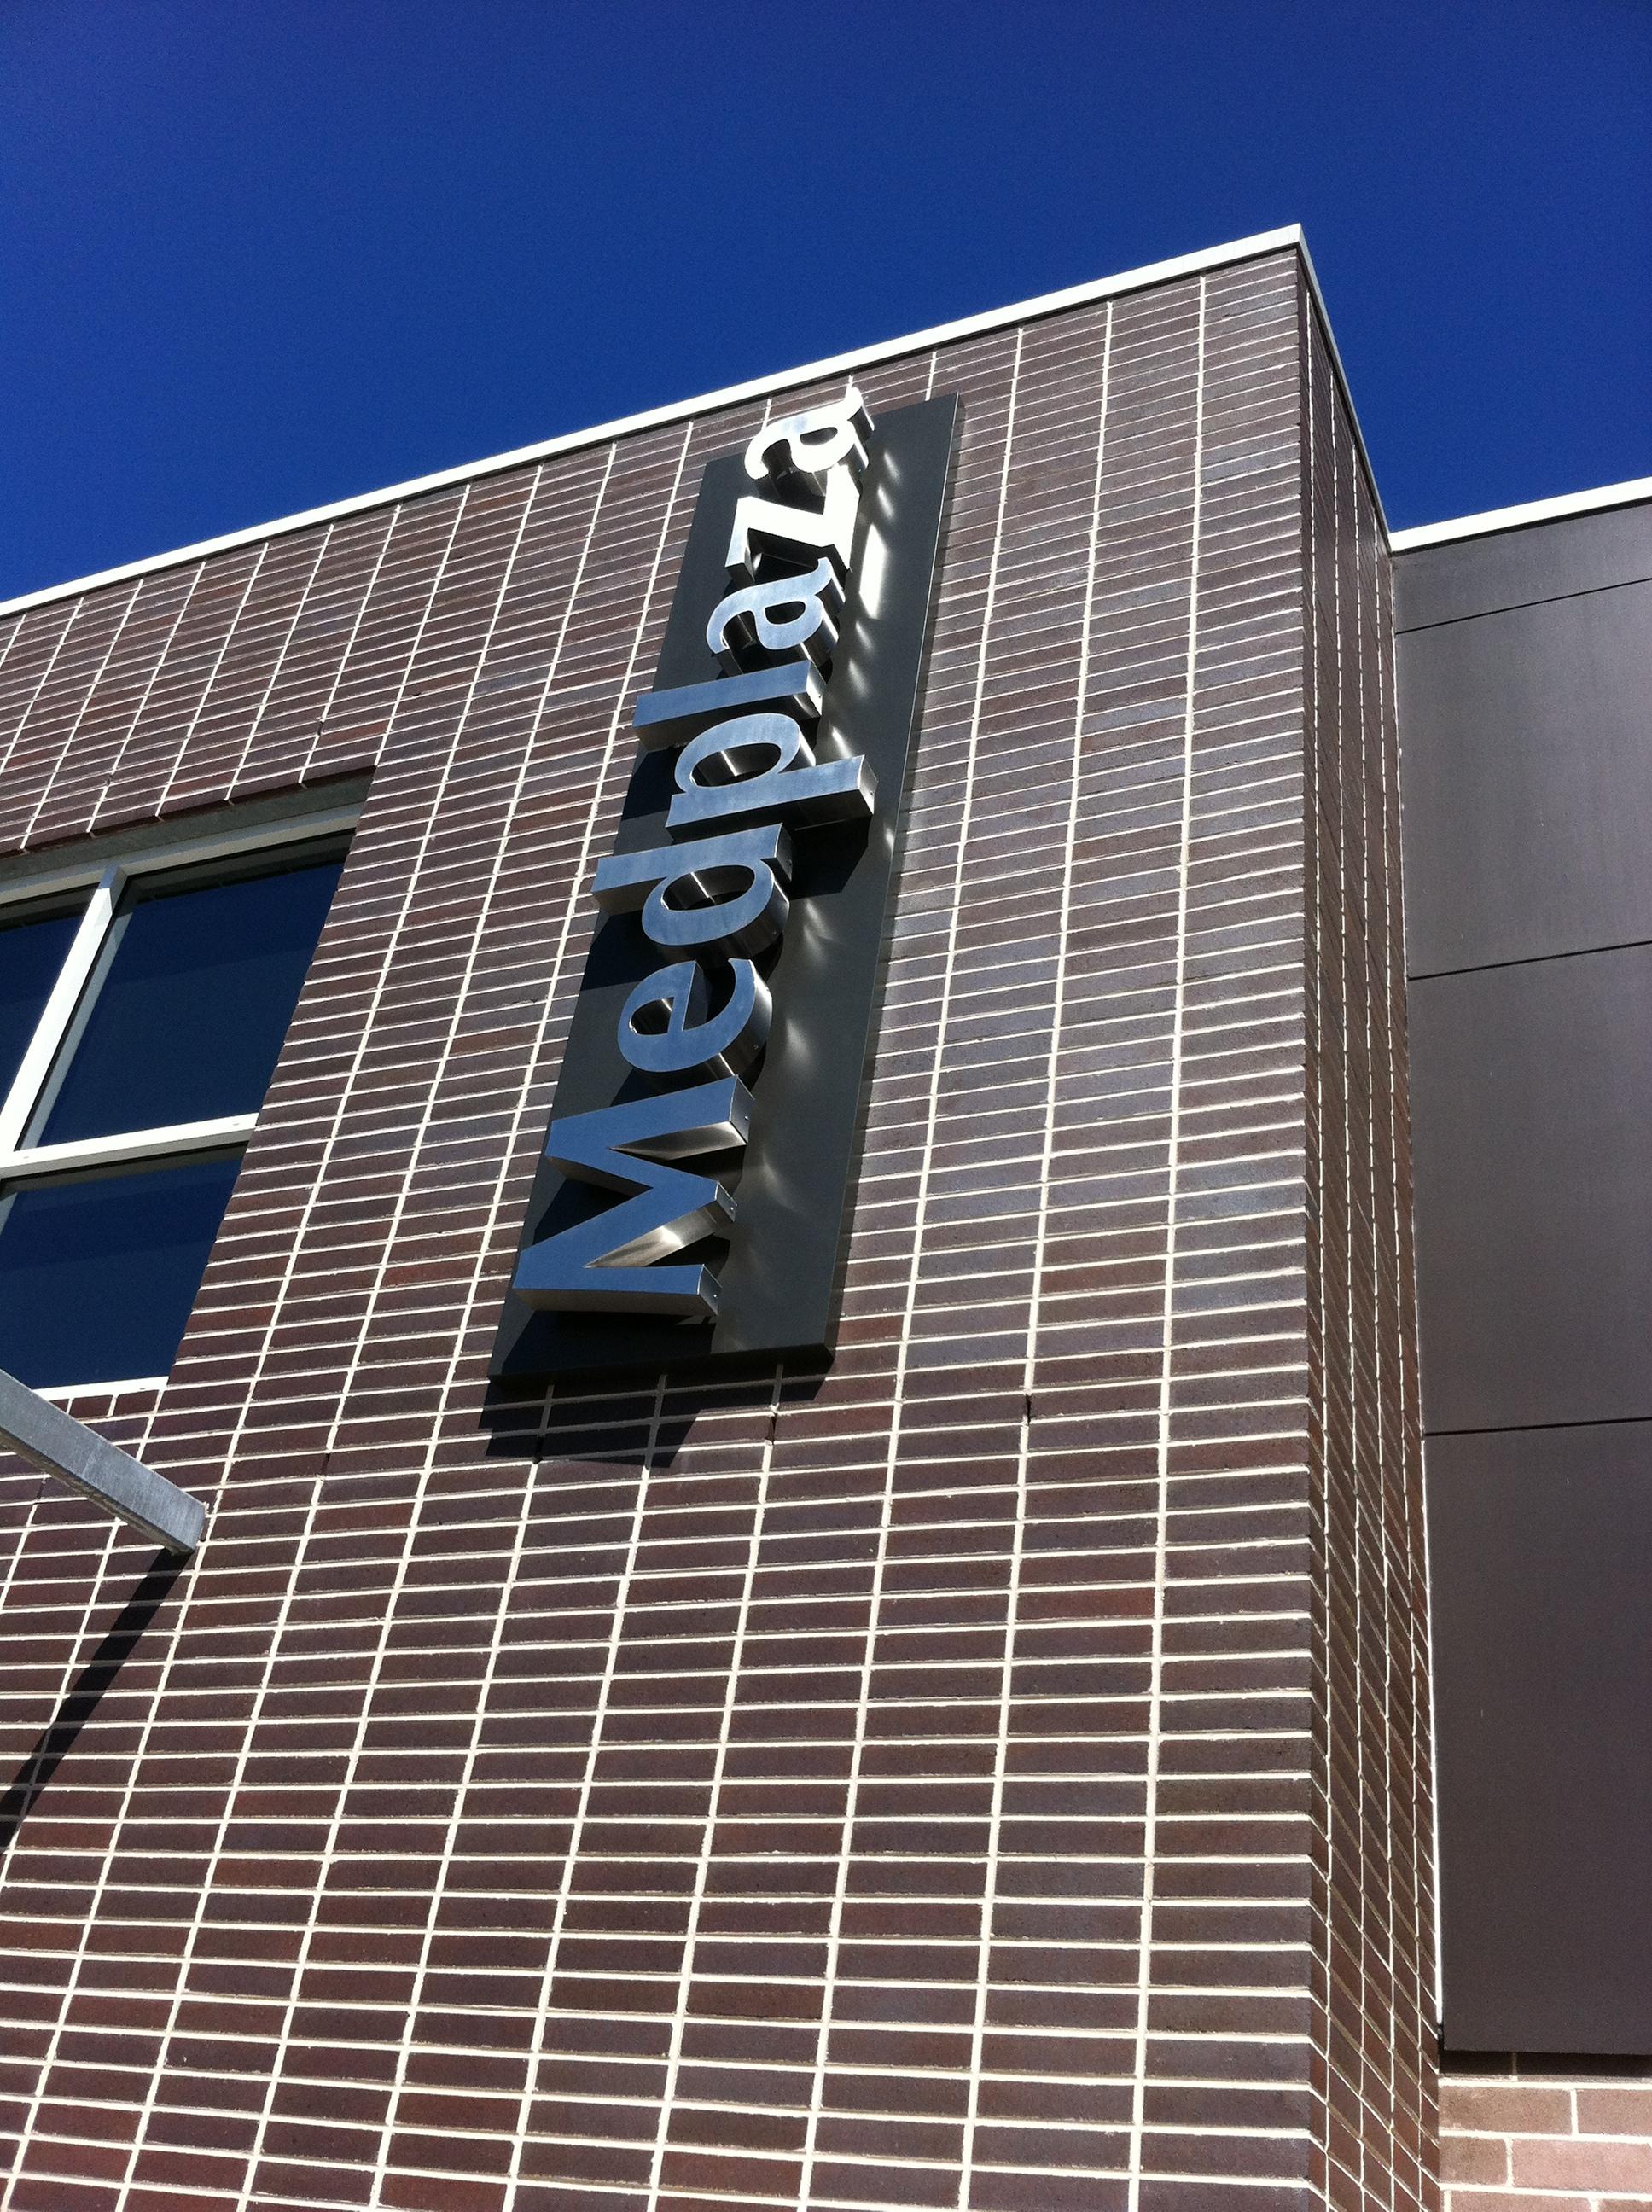 Jmac Graphics, Signage, Outdoor, Awning, 3D, Med Plaza